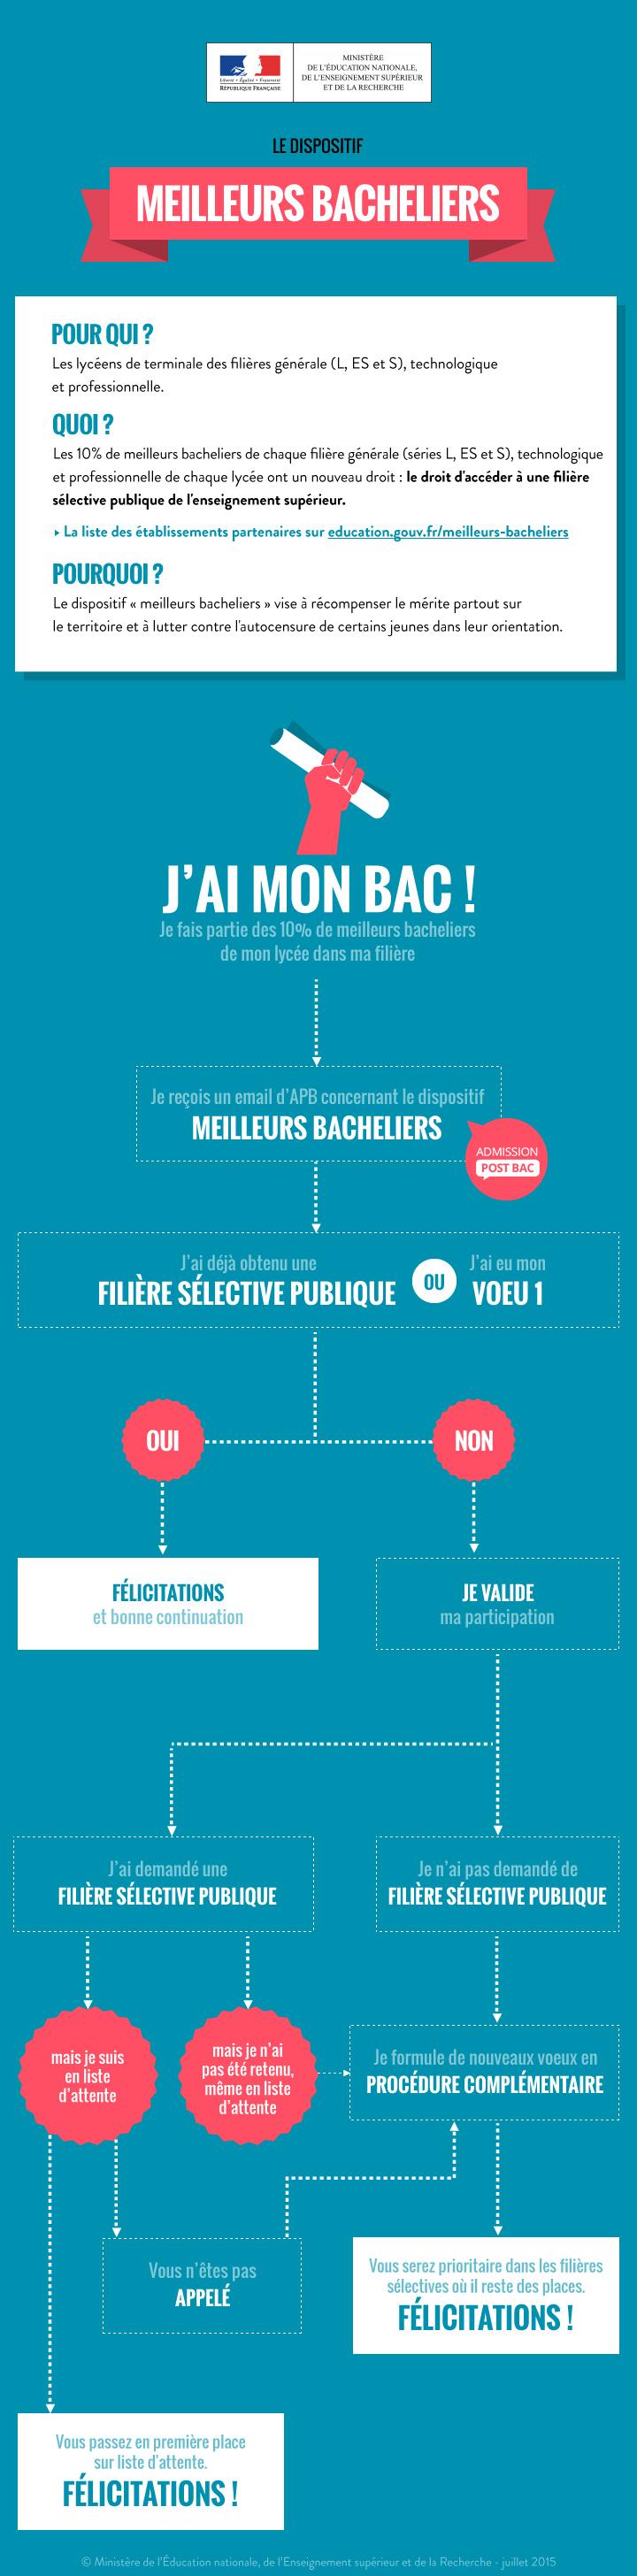 Infographie Meilleurs bacheliers - 2016